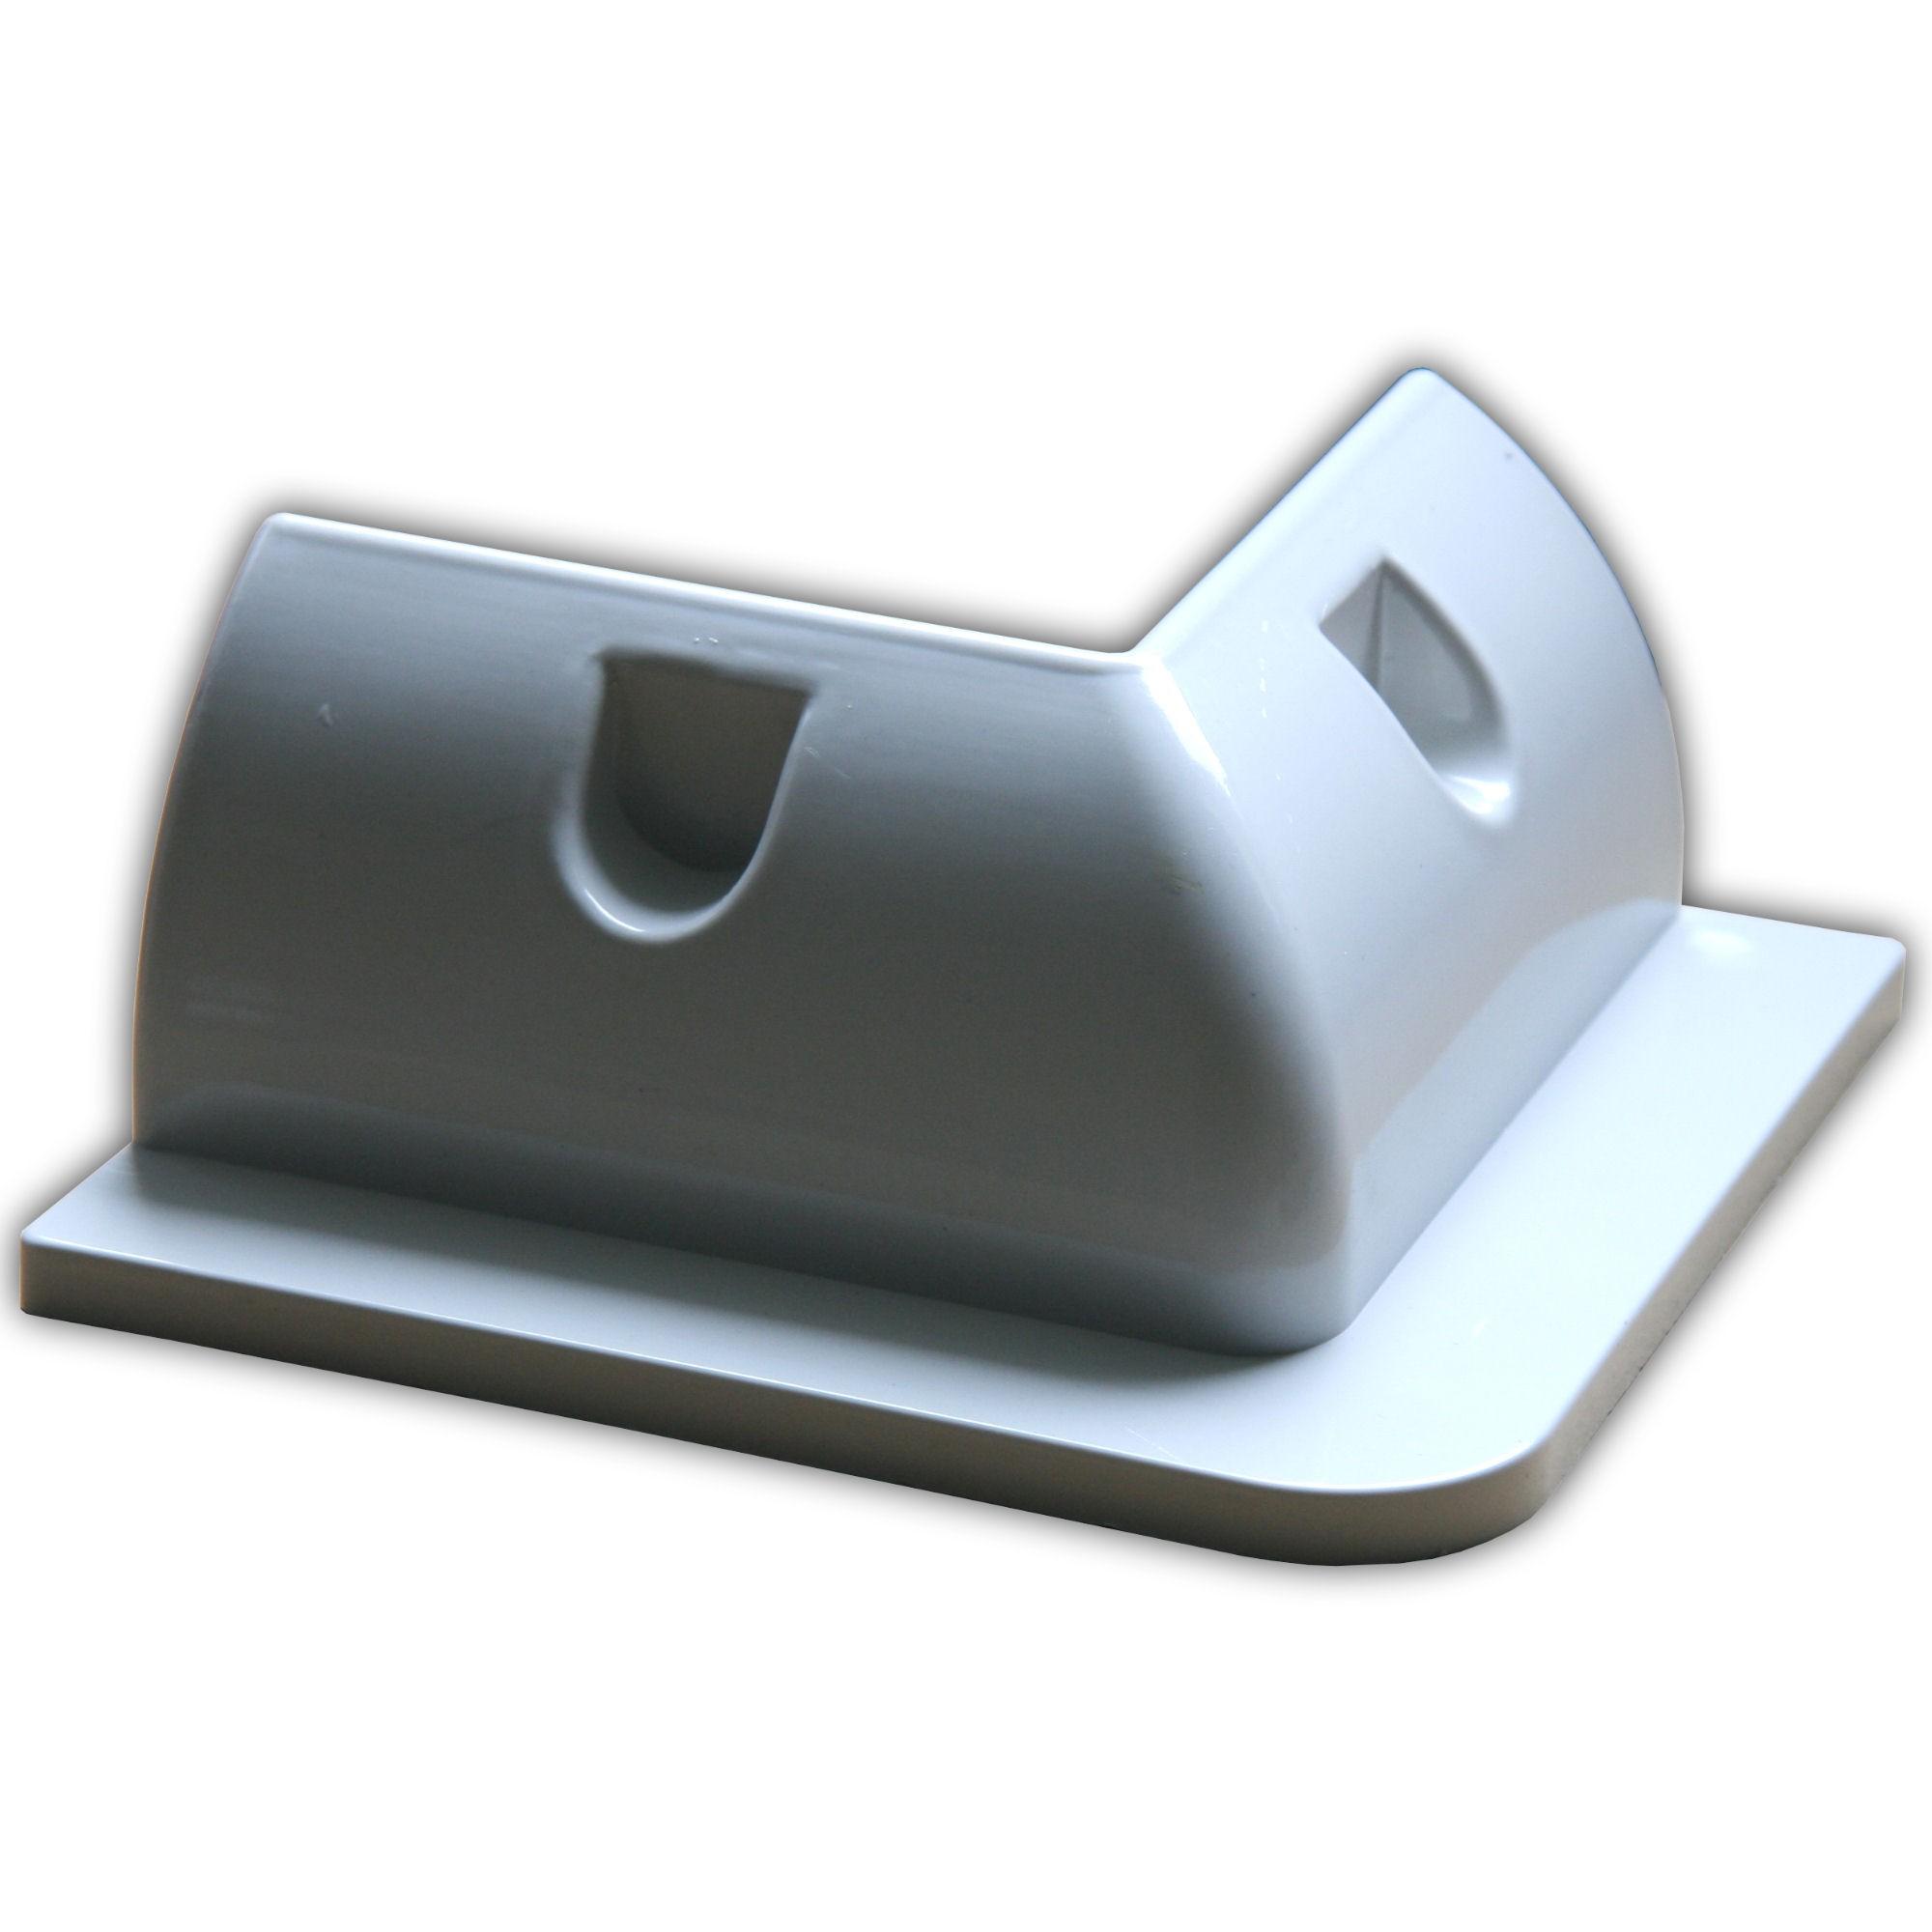 solar halterung befestigung solarmodul solarpanel eckhalterung solarhalterung ebay. Black Bedroom Furniture Sets. Home Design Ideas